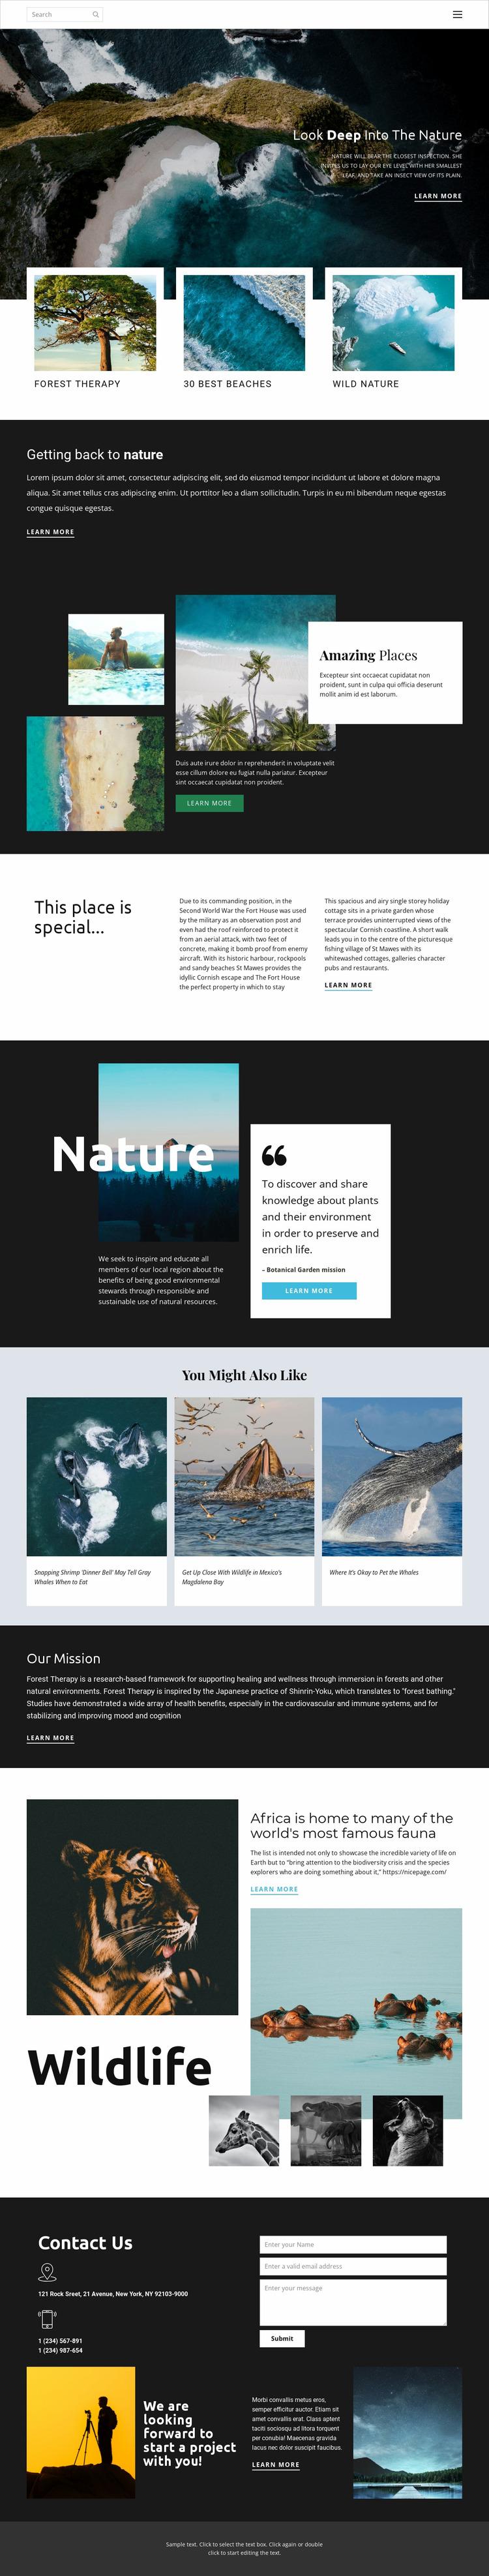 Exploring wildlife and nature Html Website Builder